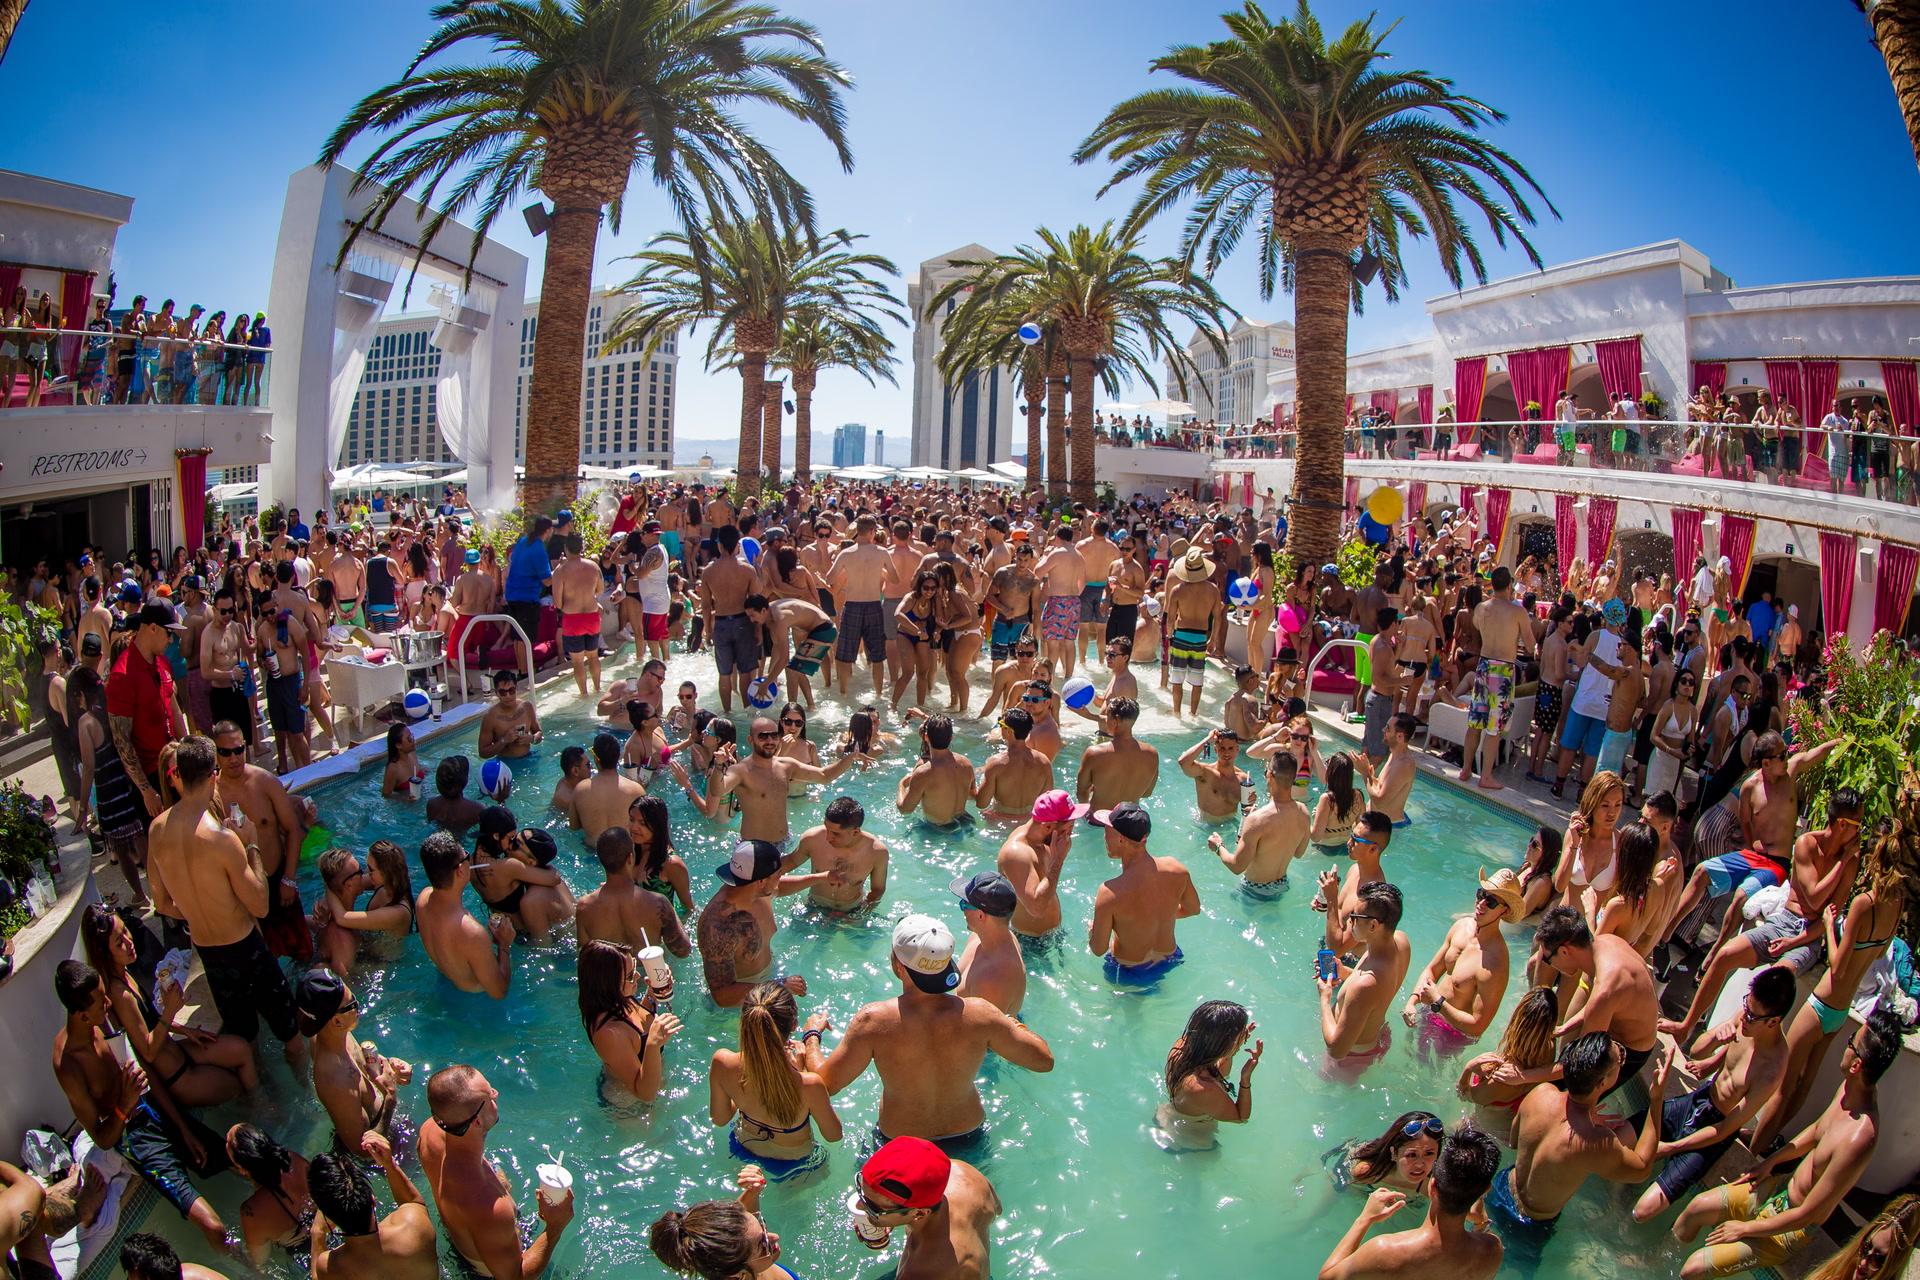 Las Vegas Pools Free For Locals 2019 Las Vegas Review